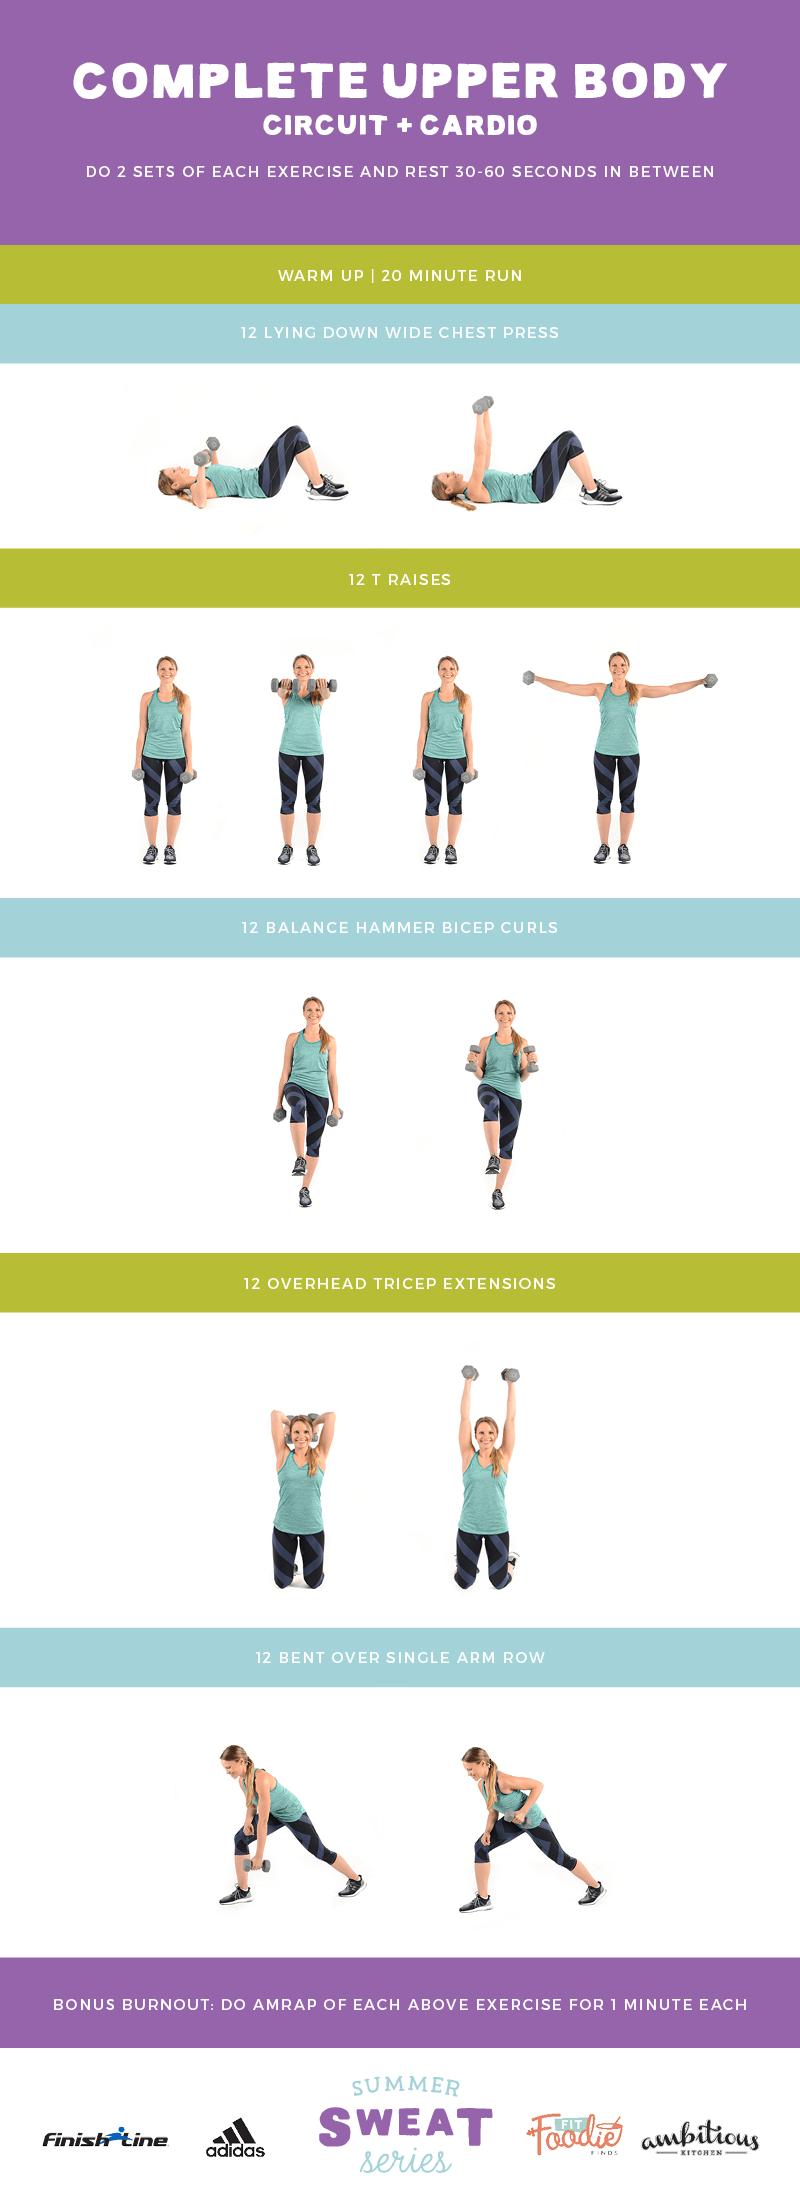 complete-upper-bod-cardio